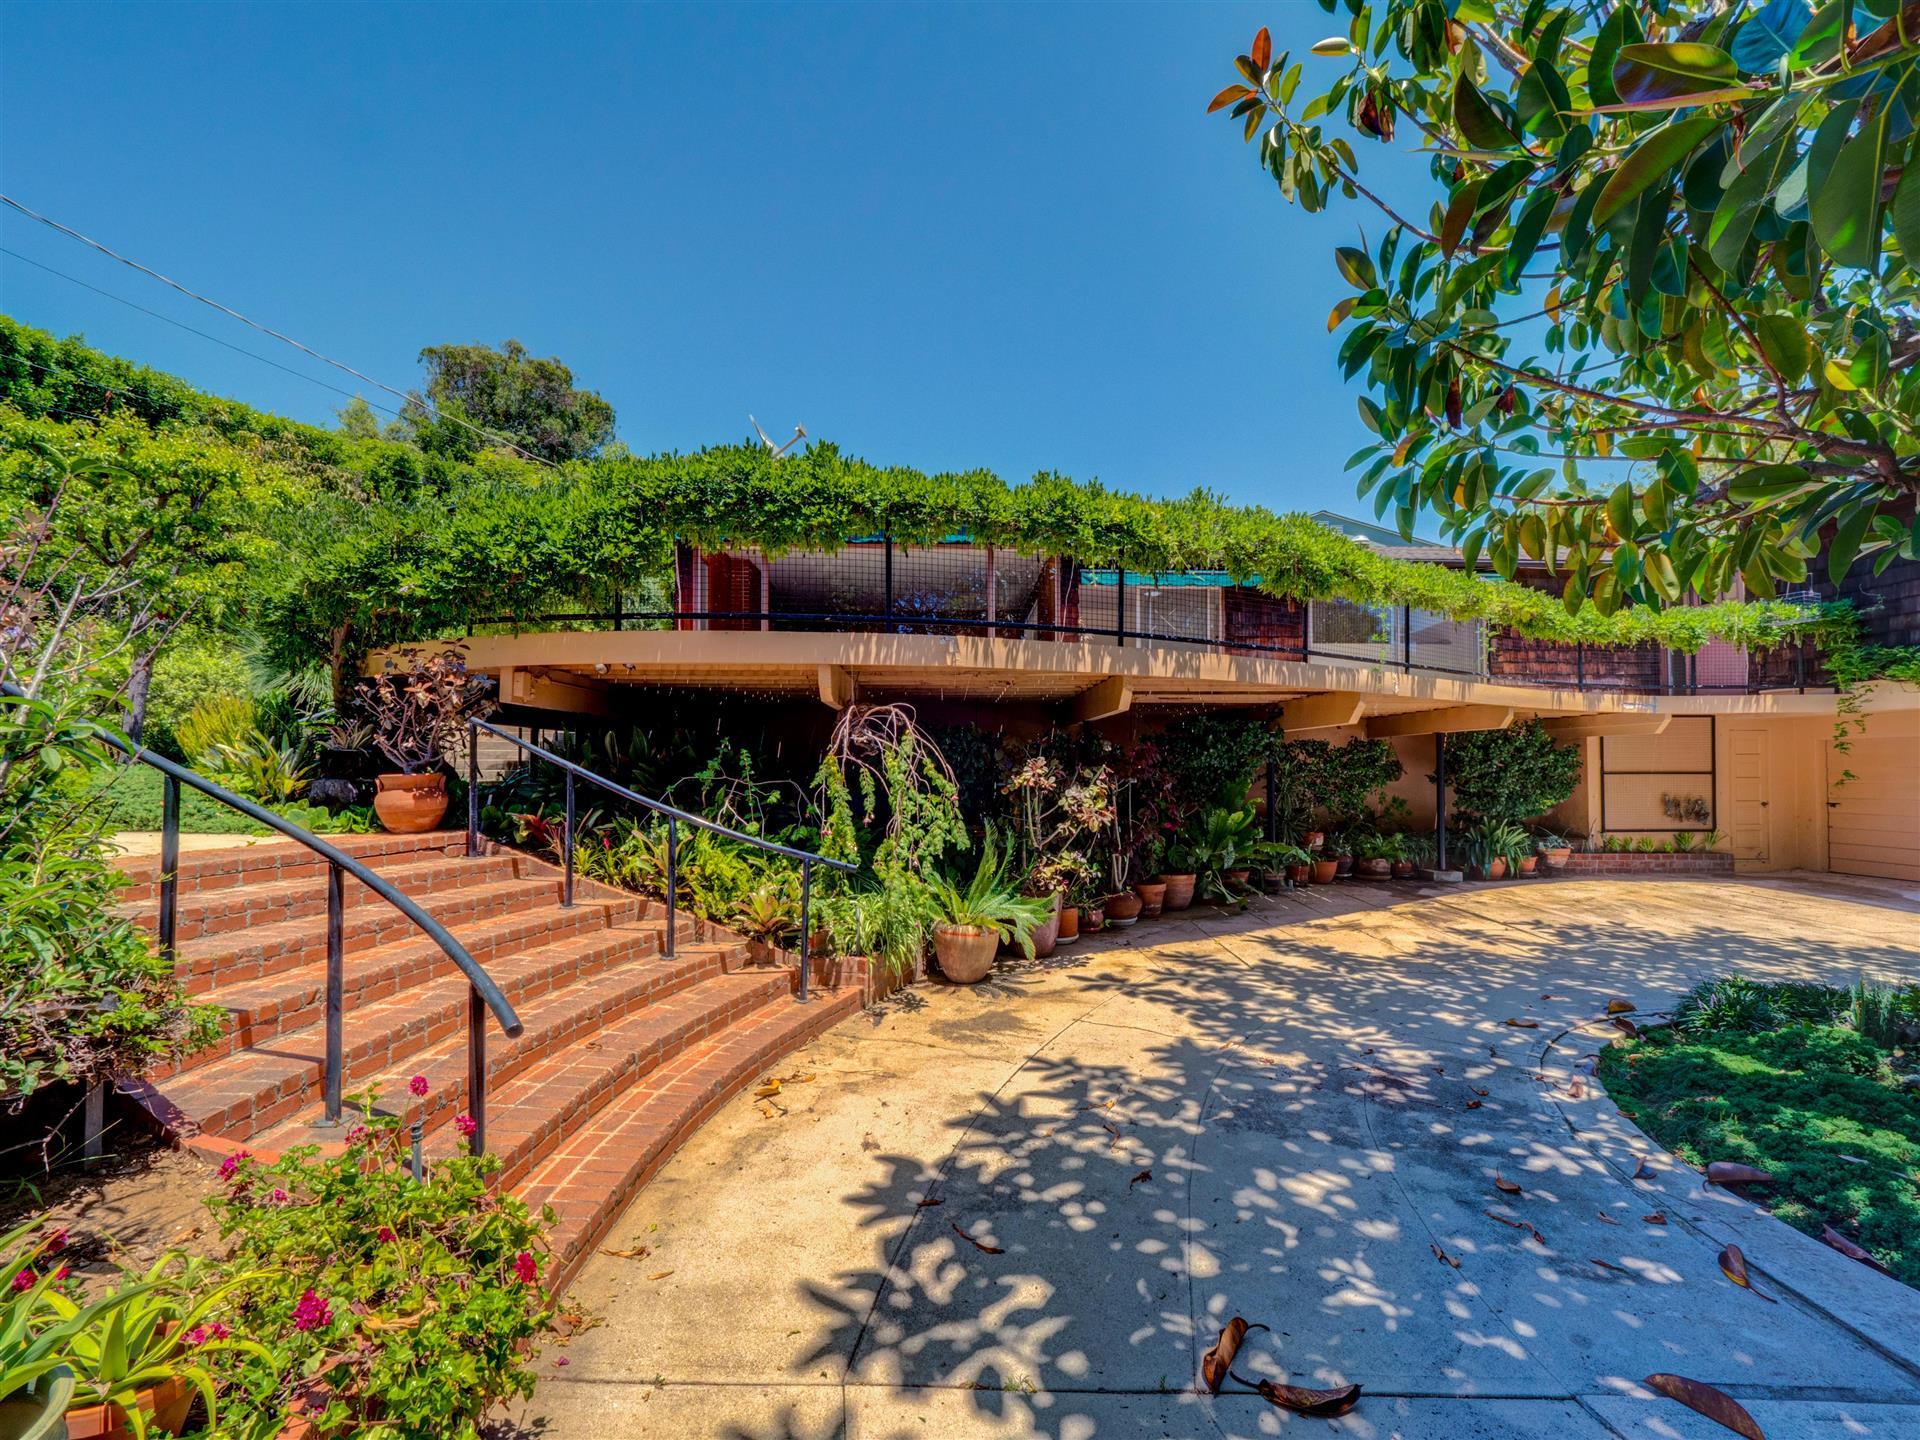 837 Muskingum,Pacific Palisades,California 90272,3 Bedrooms Bedrooms,2 BathroomsBathrooms,Home,Muskingum,1055